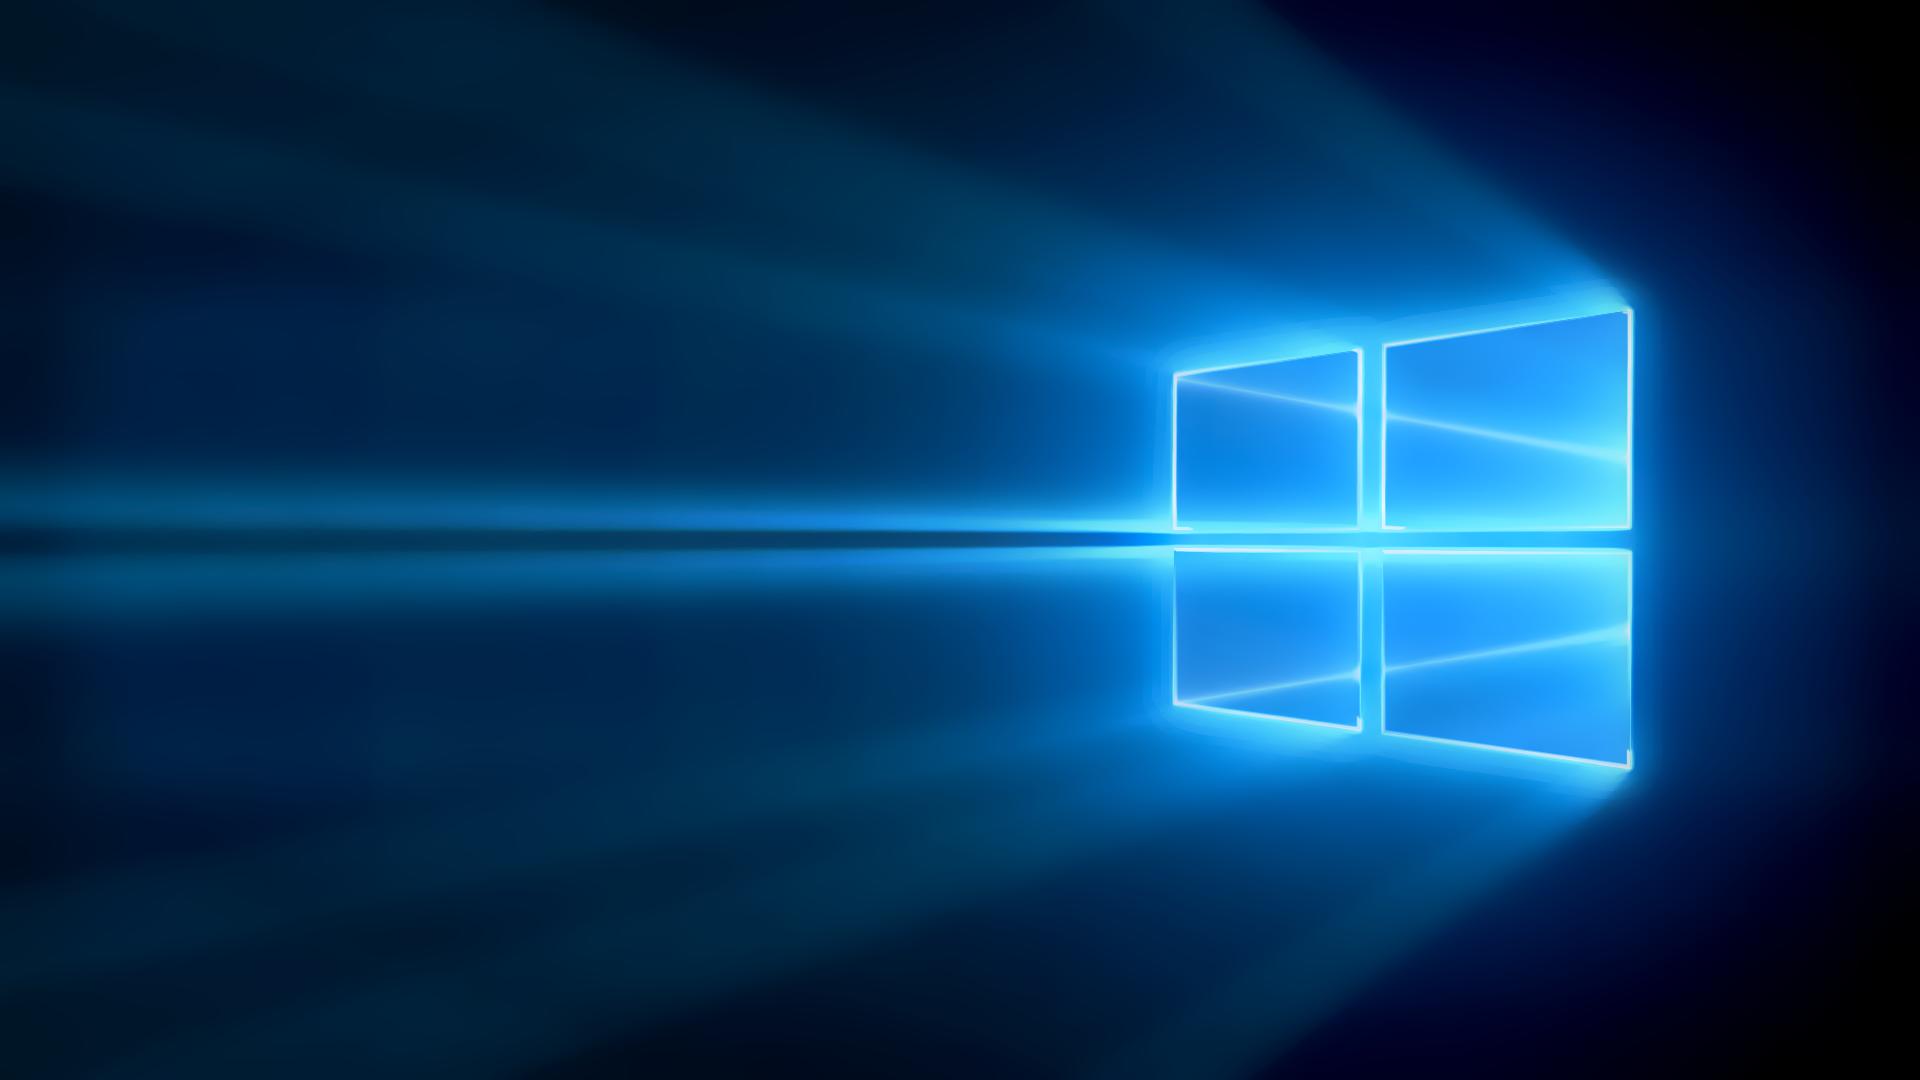 Hng Dn Active Windows 10 Home Pro Bn Chnh Thc Blog 1920x1080